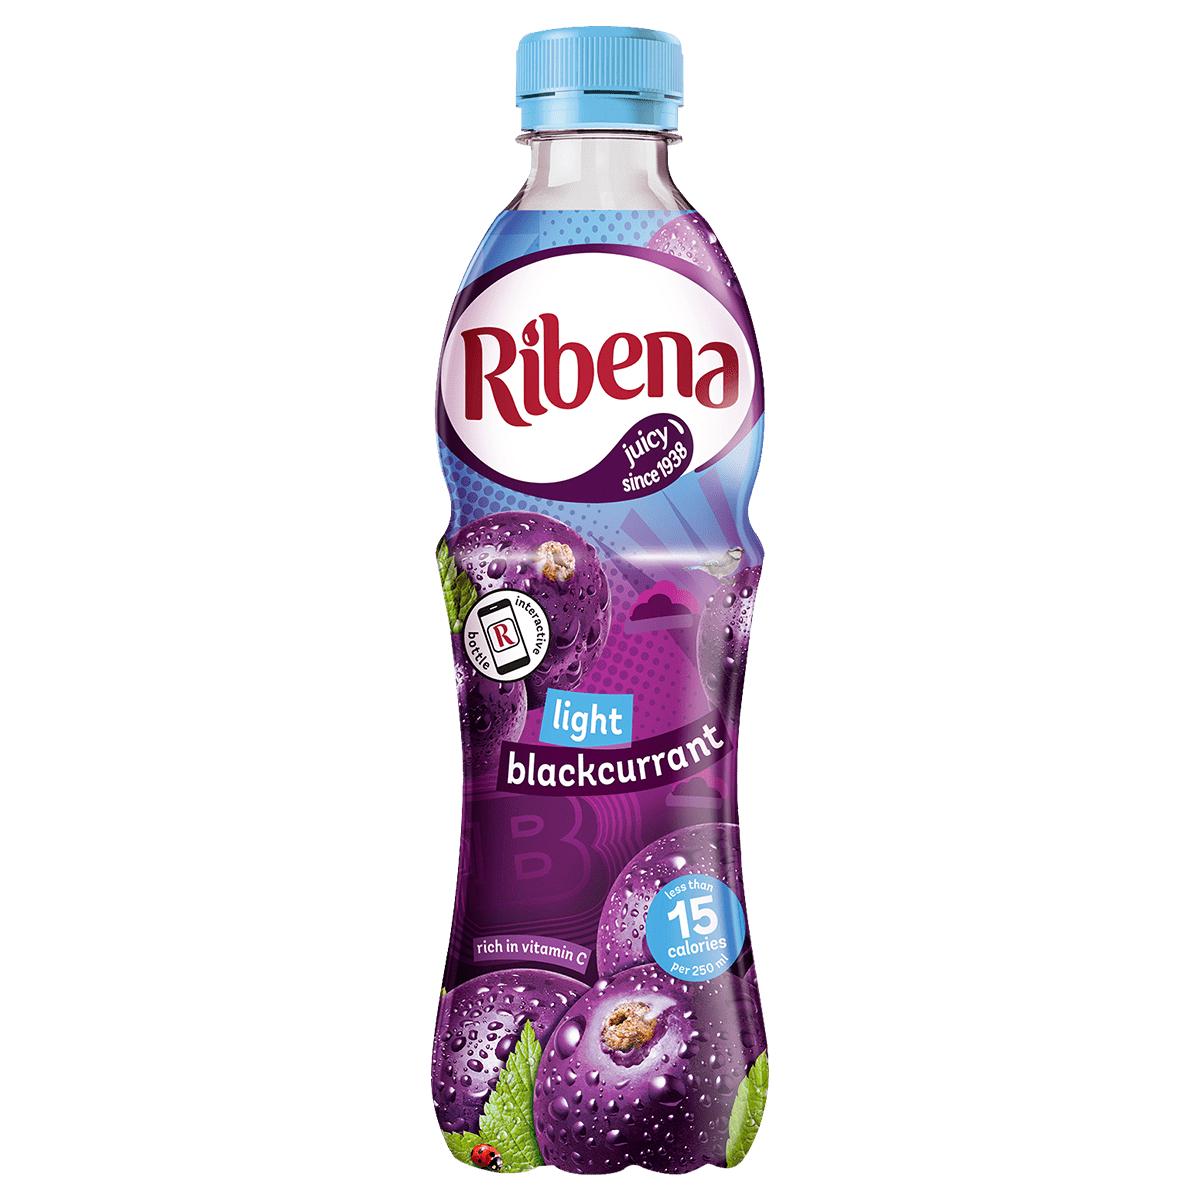 Ribena Light Blackcurrant Juice Drink 500ml 20p @ Quality Save Prestwich (BBE October 2019)